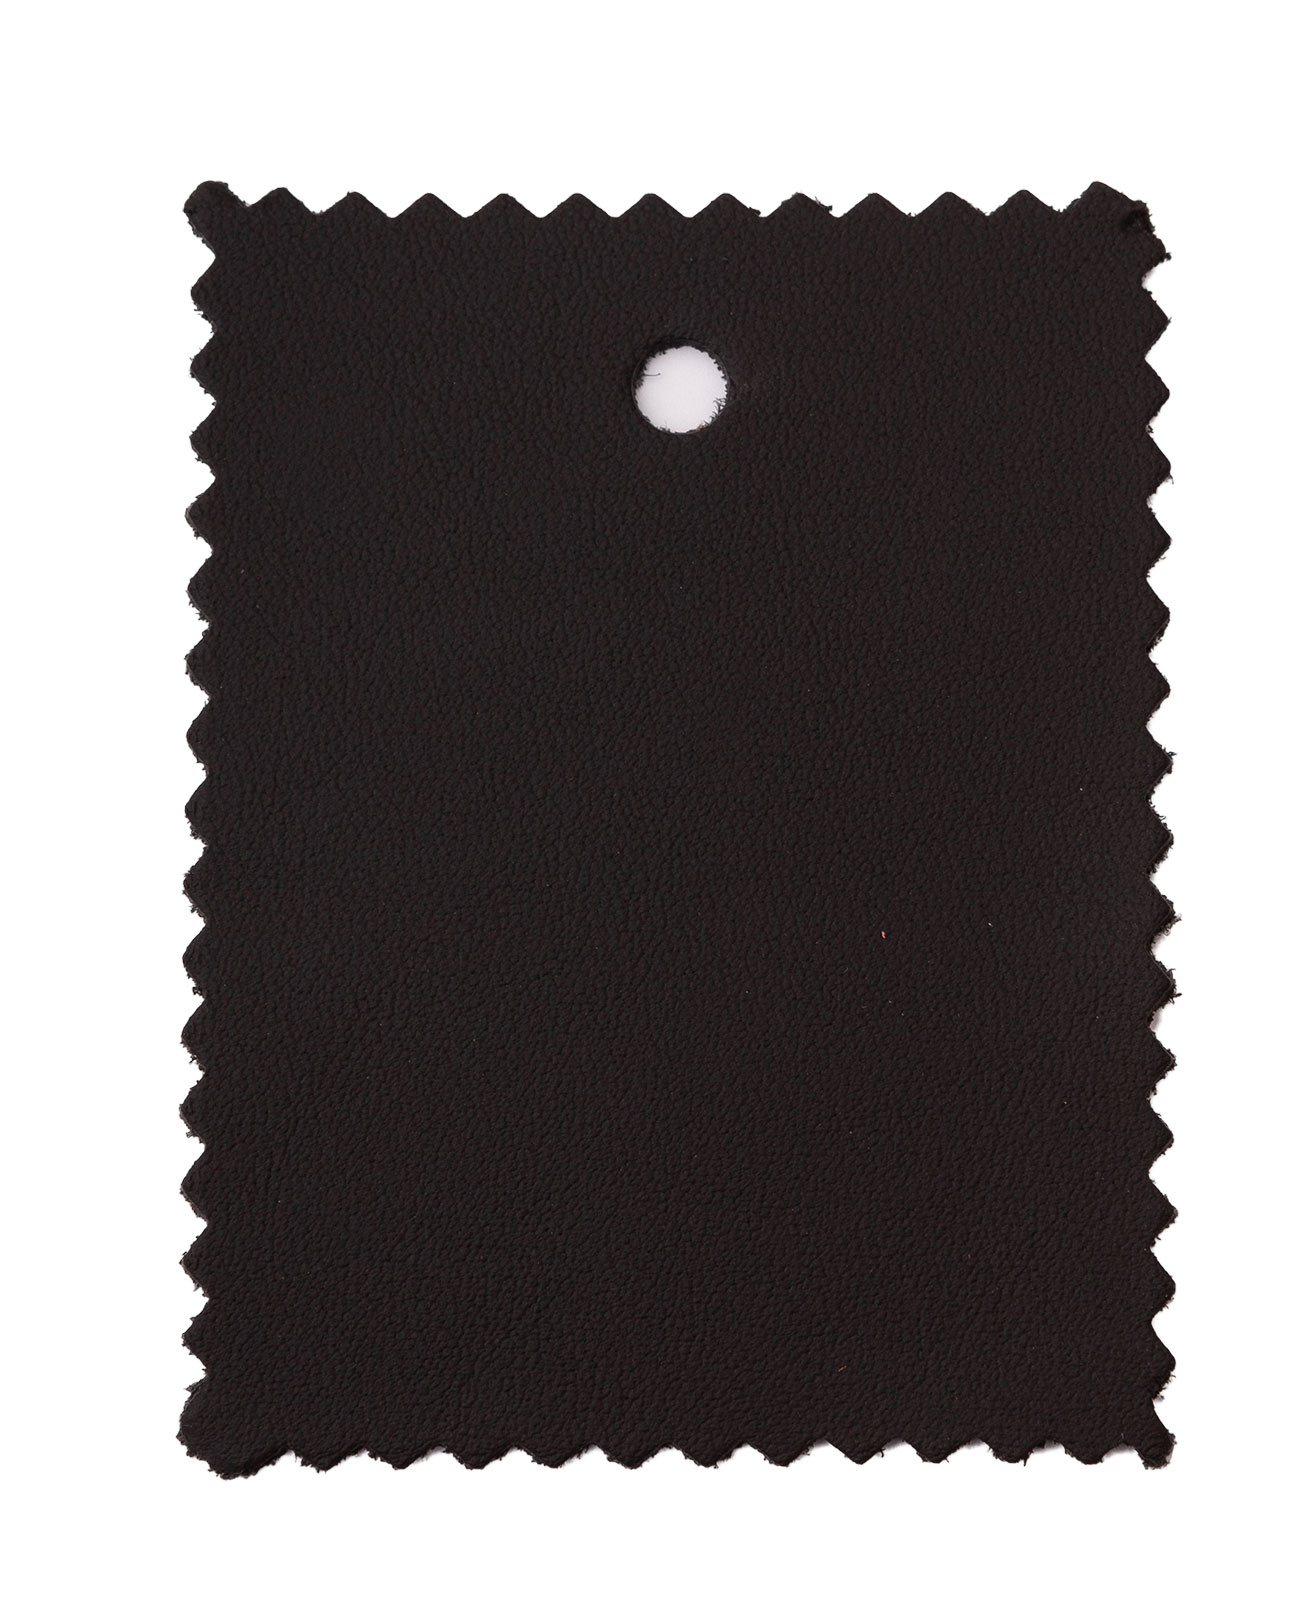 Abbildung porsche-walknappa-schwarz